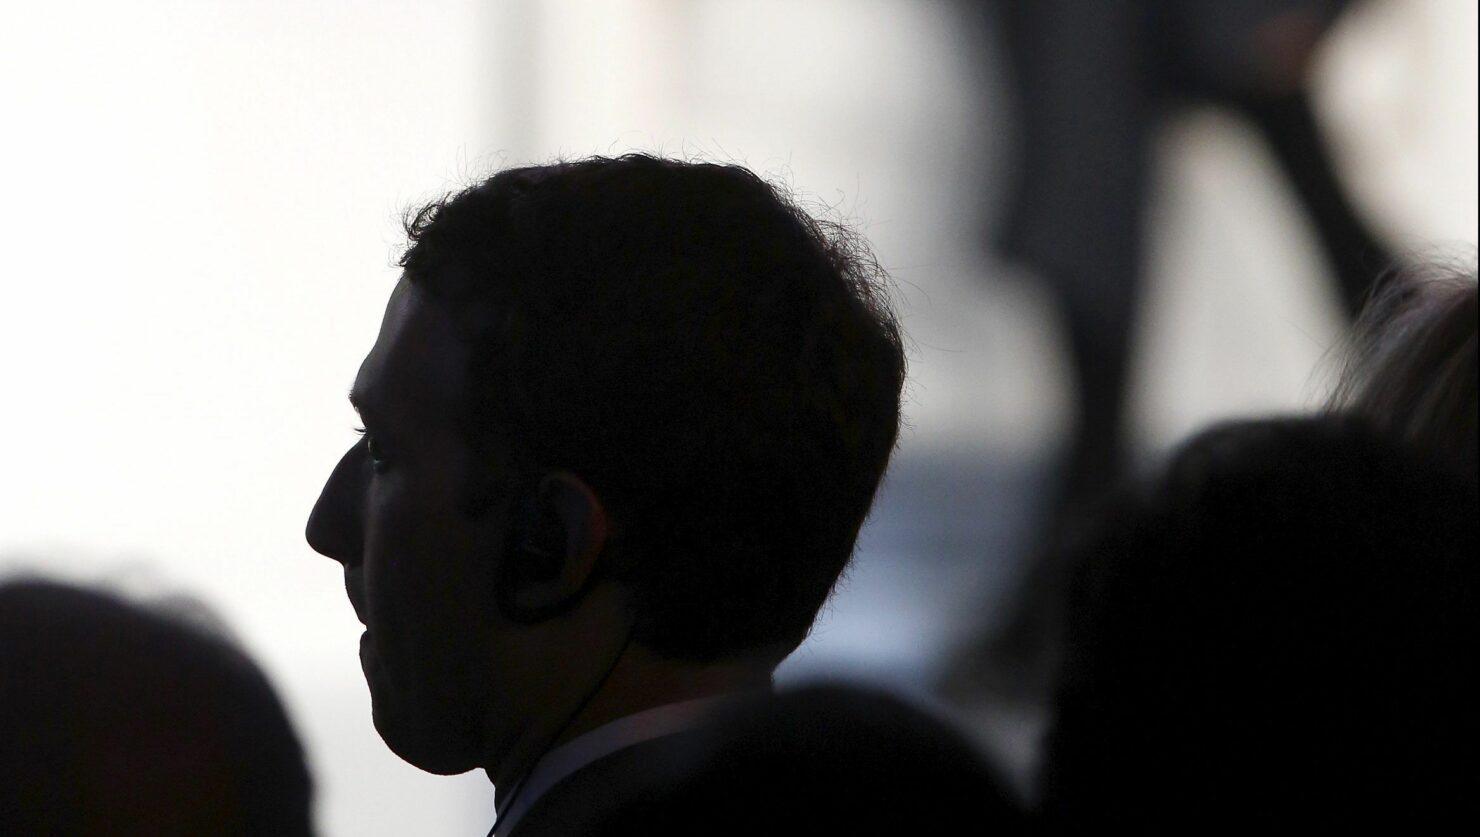 mark Zuckerberg facebook cambridge analytica